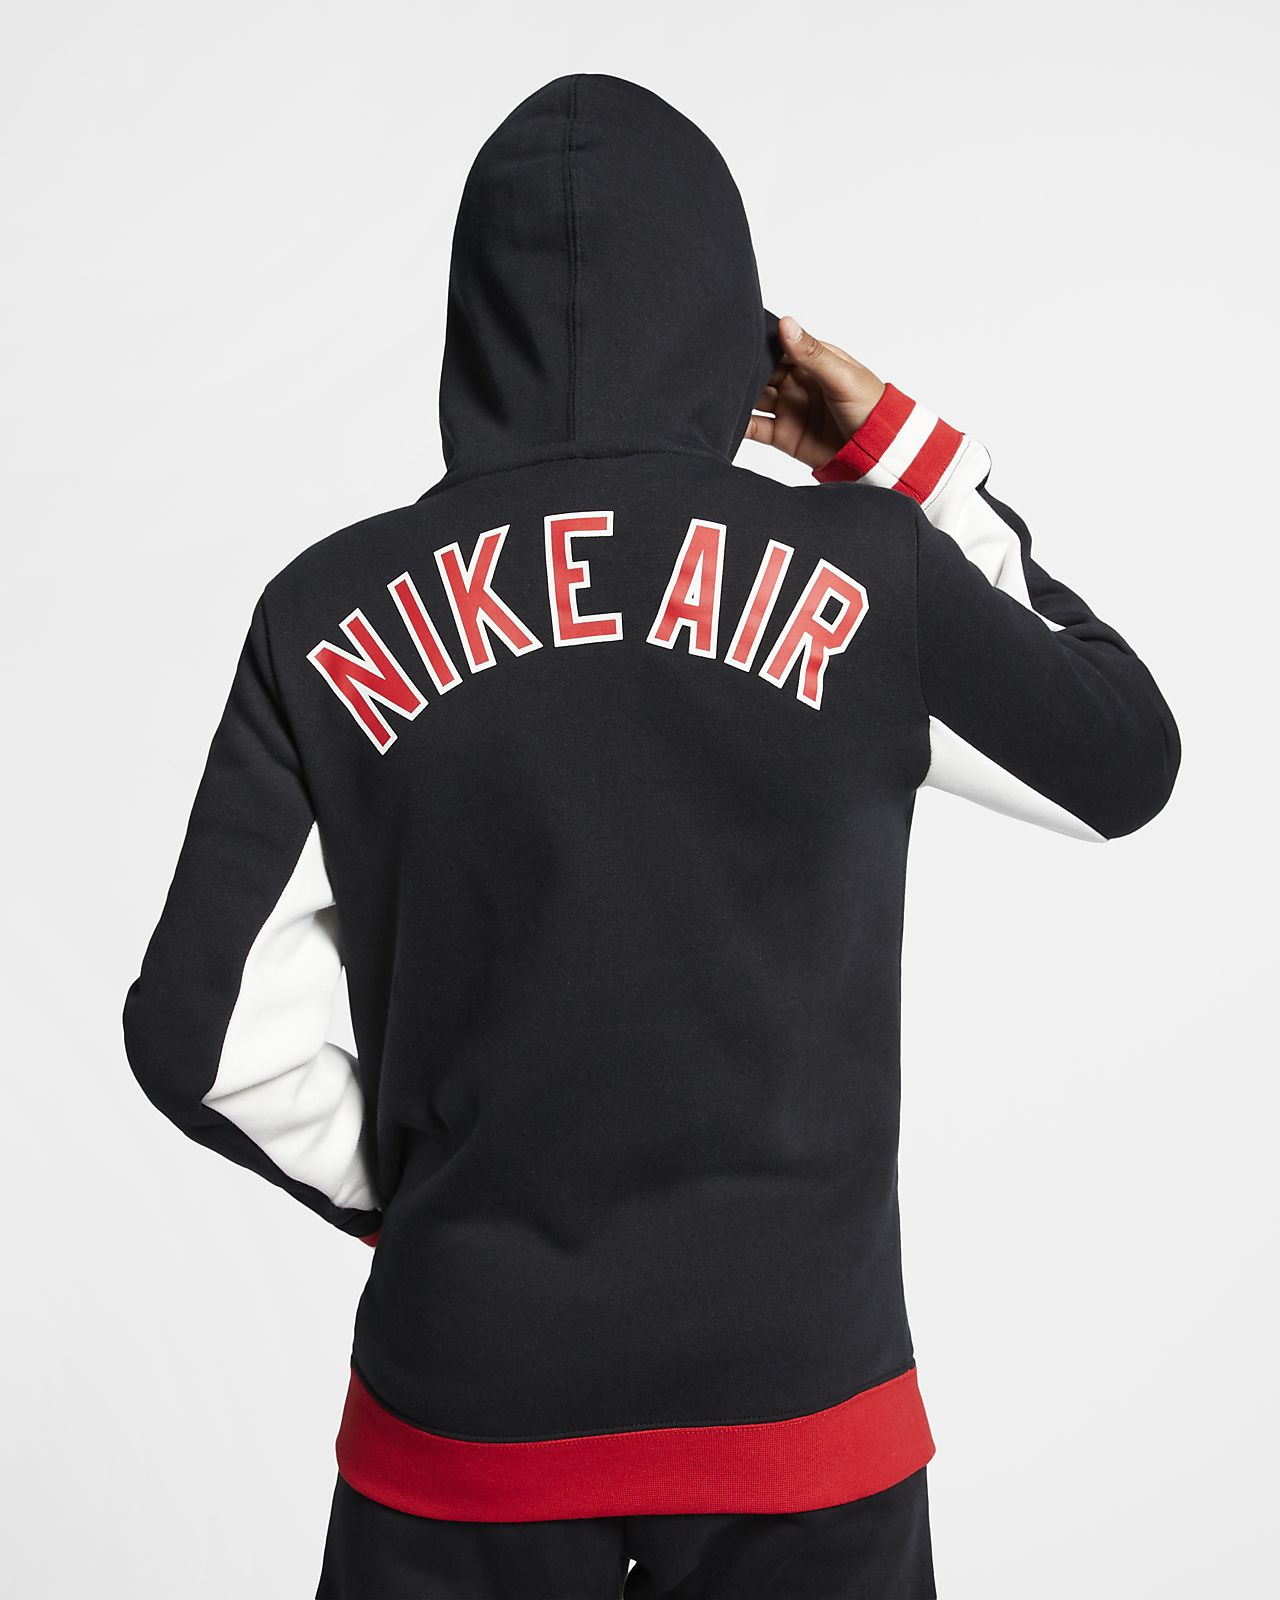 0eef4cf804 Nike Air hosszú cipzáras, kapucnis pulóver nagyobb gyerekeknek. Nike ...